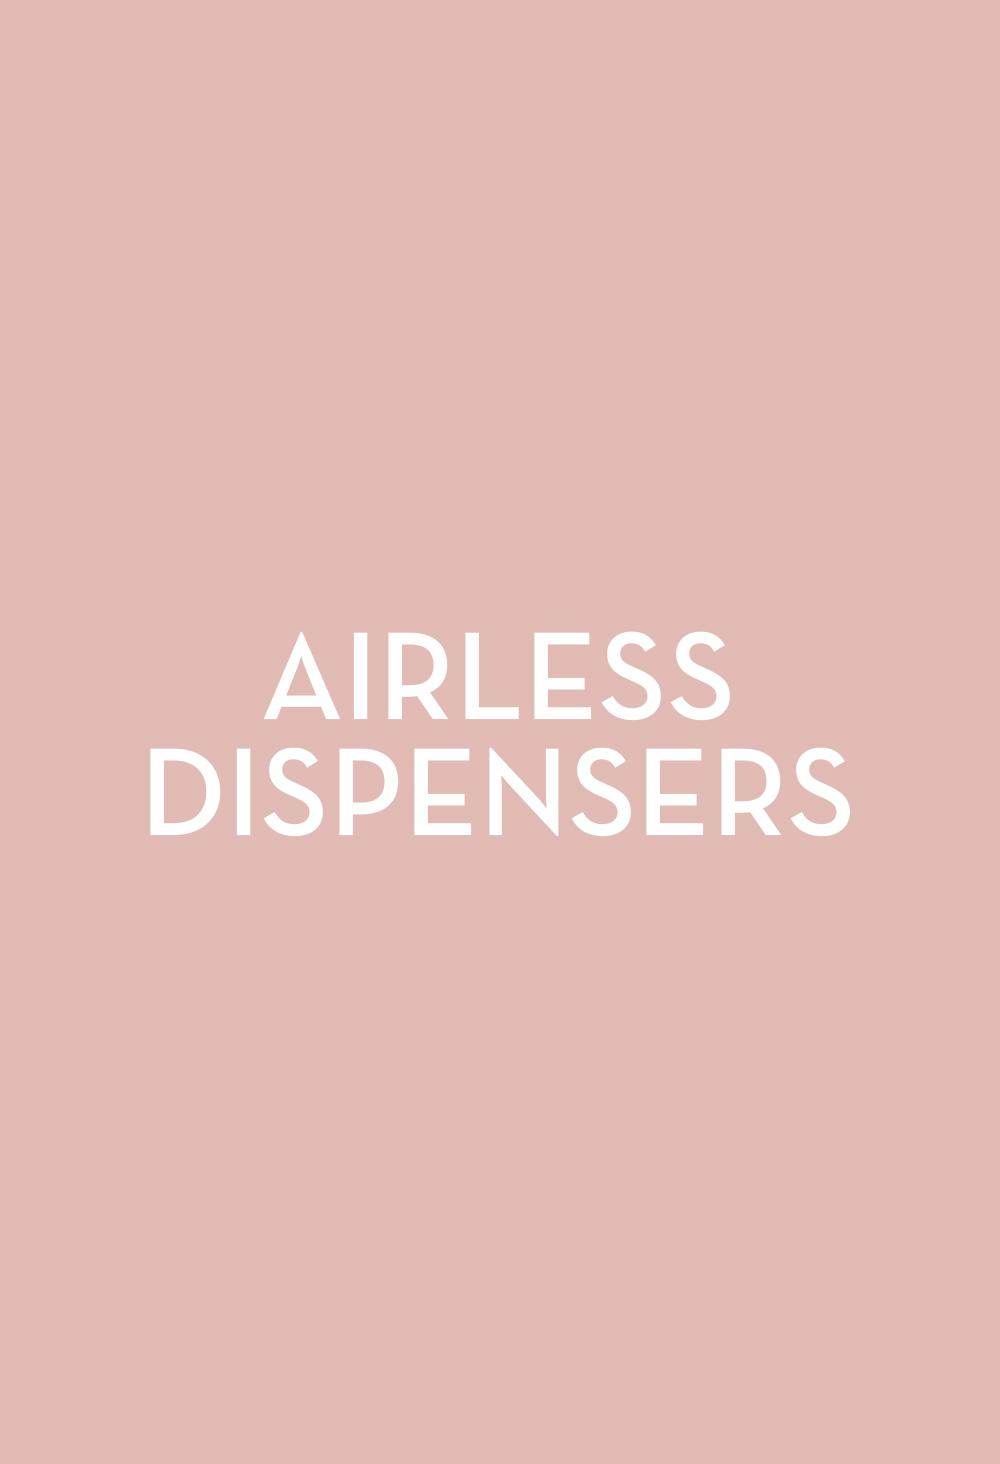 Airless Dispensers - Fasten